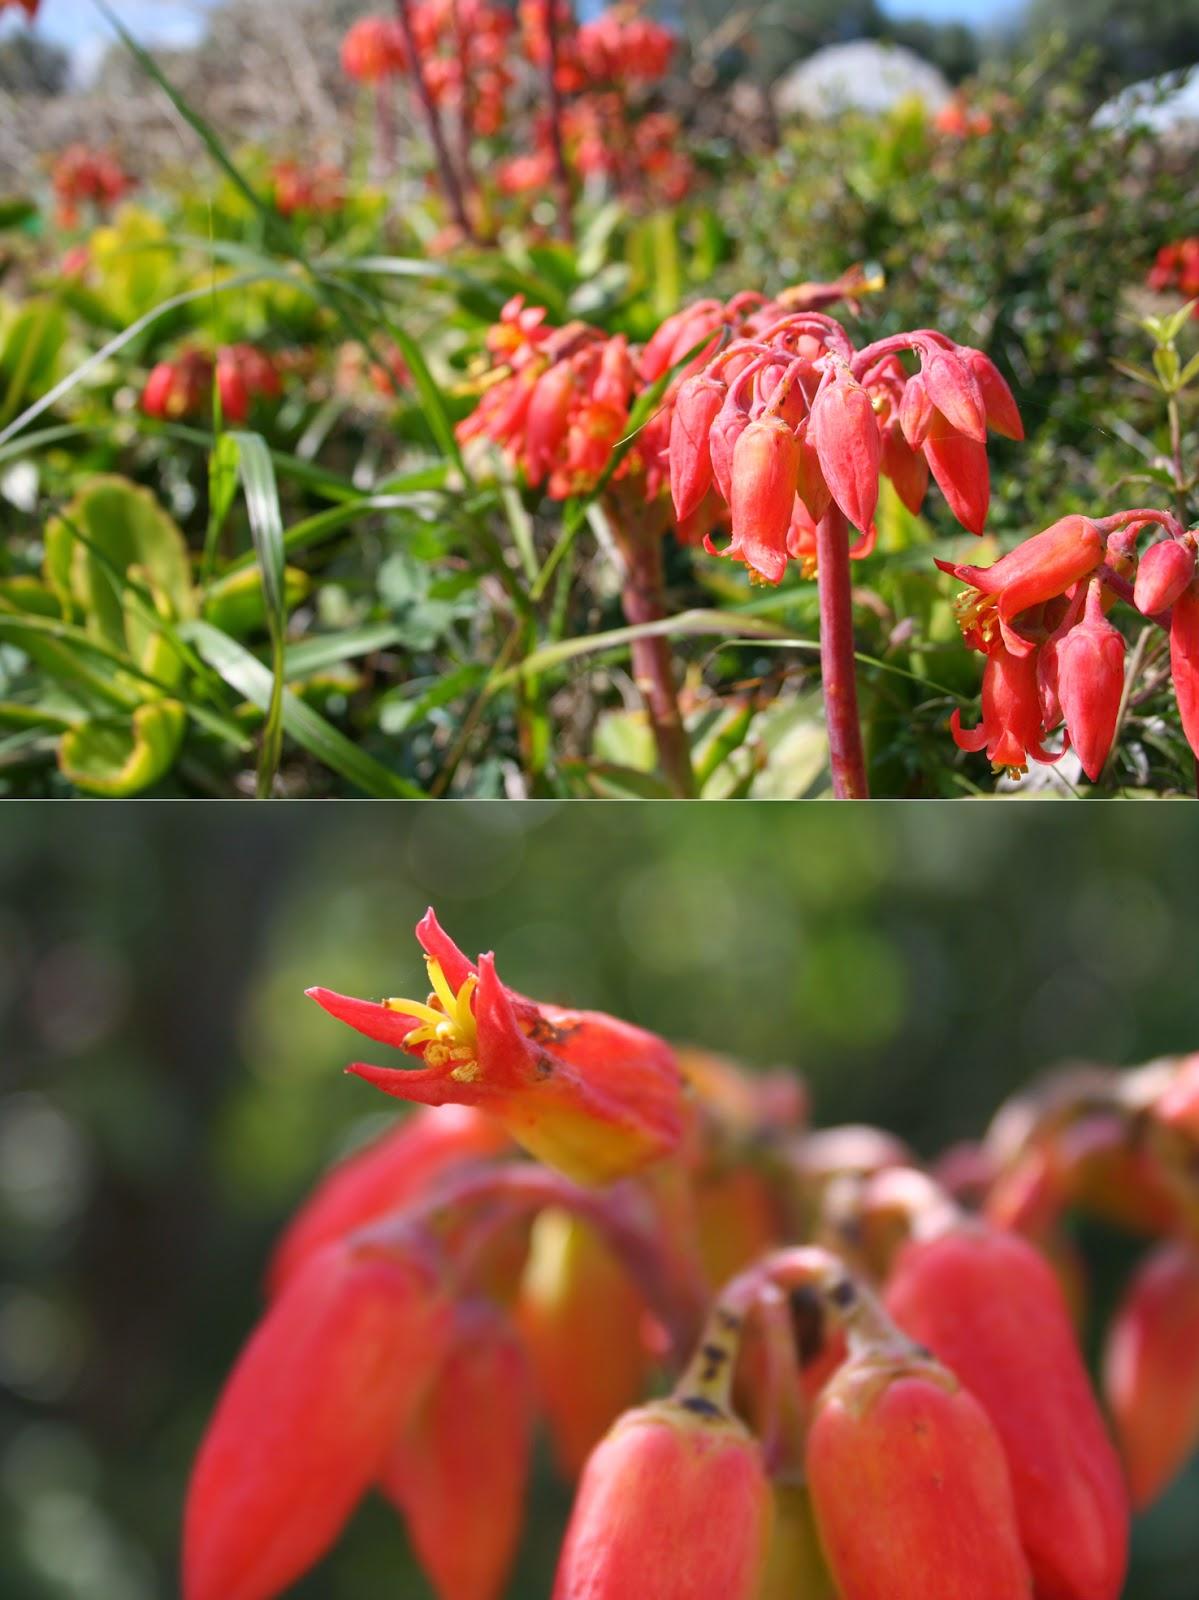 El blog de Coches Menorca: Flores silvestres